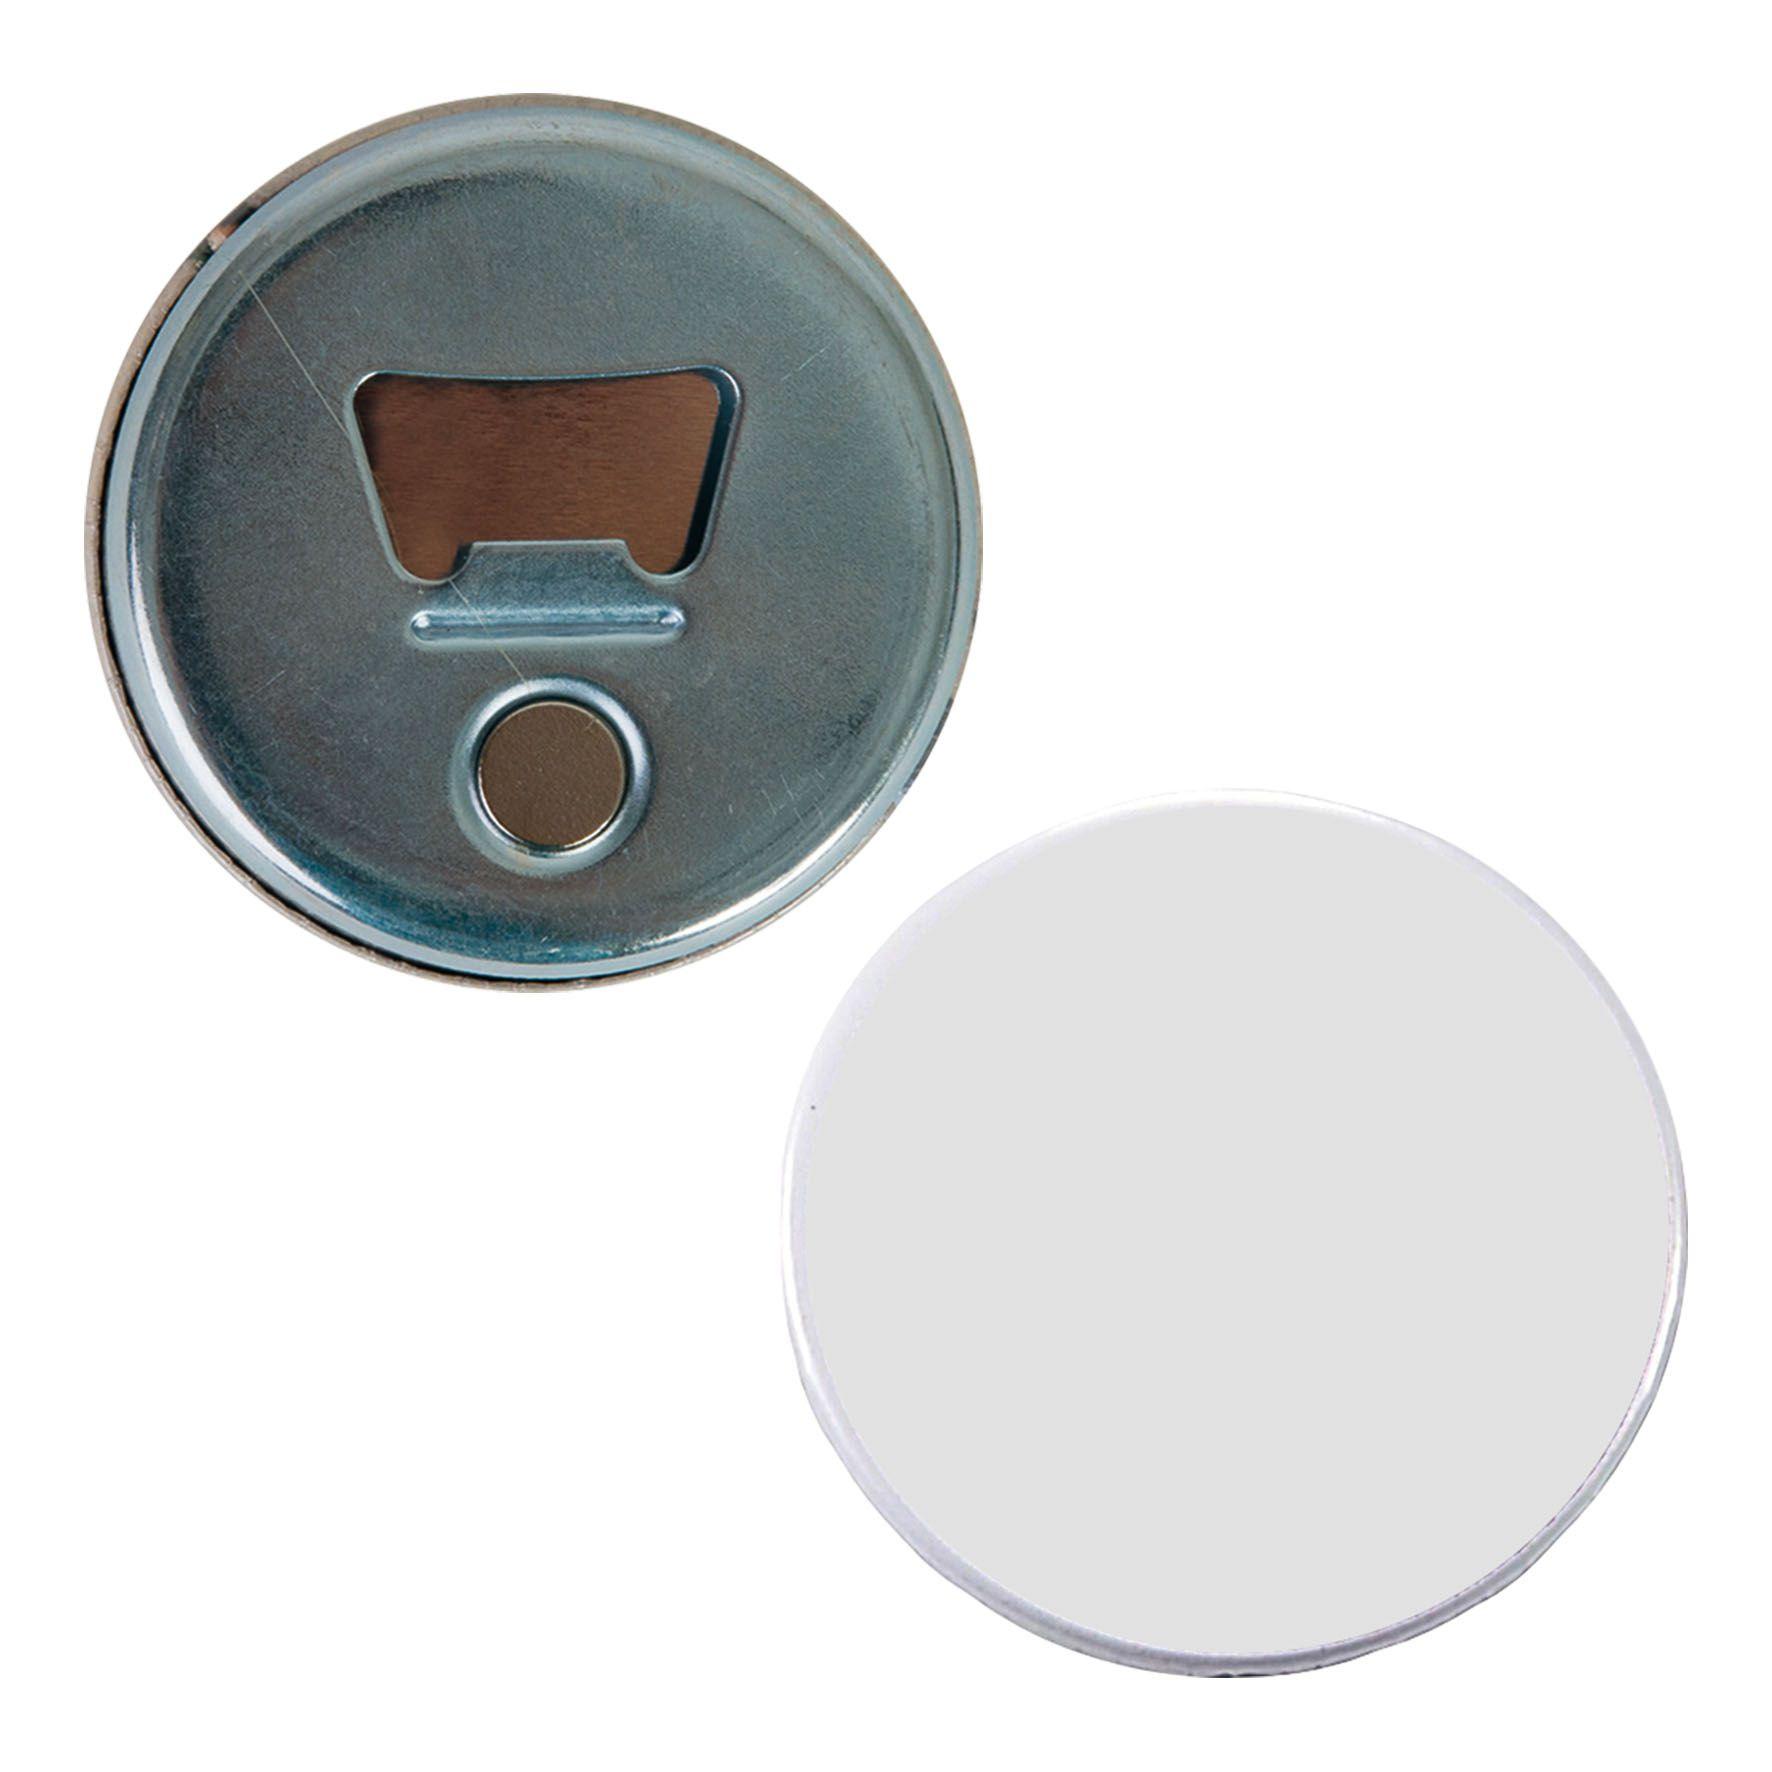 Goodies - Decapsuleur personnalisable Magnet